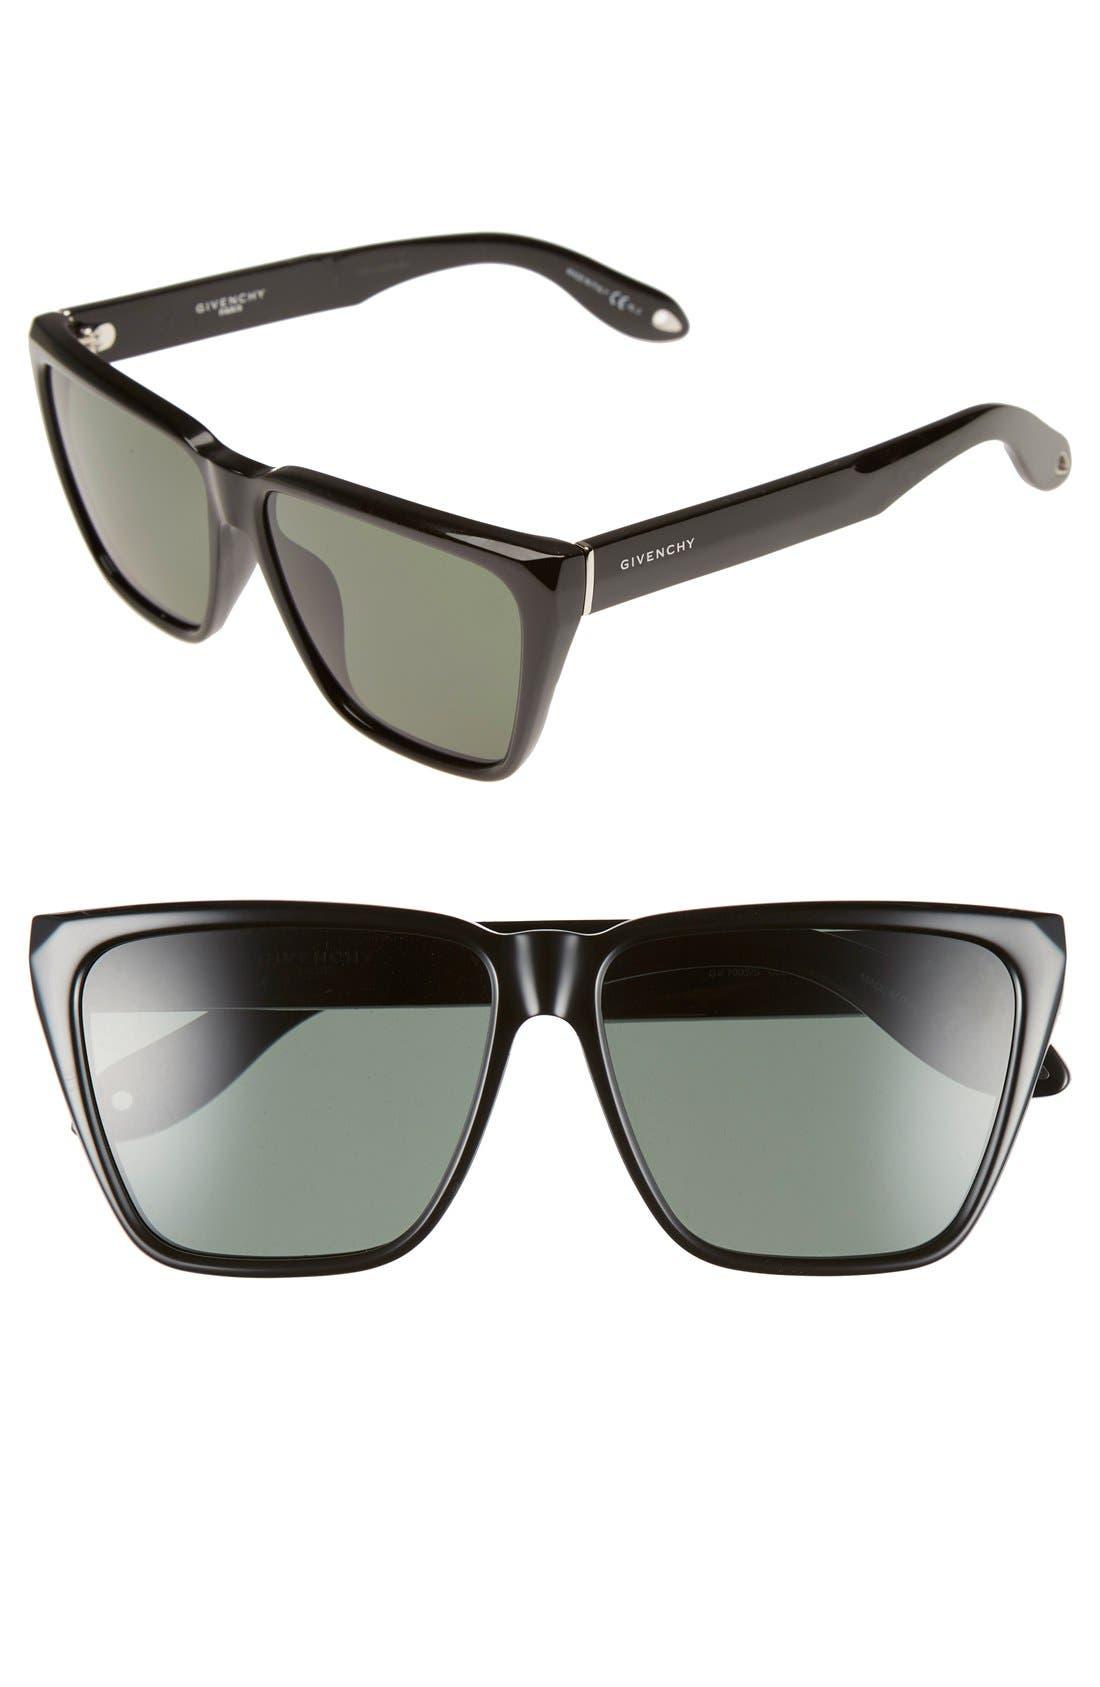 58mm Flat Top Sunglasses,                             Main thumbnail 1, color,                             Black/ Grey Green